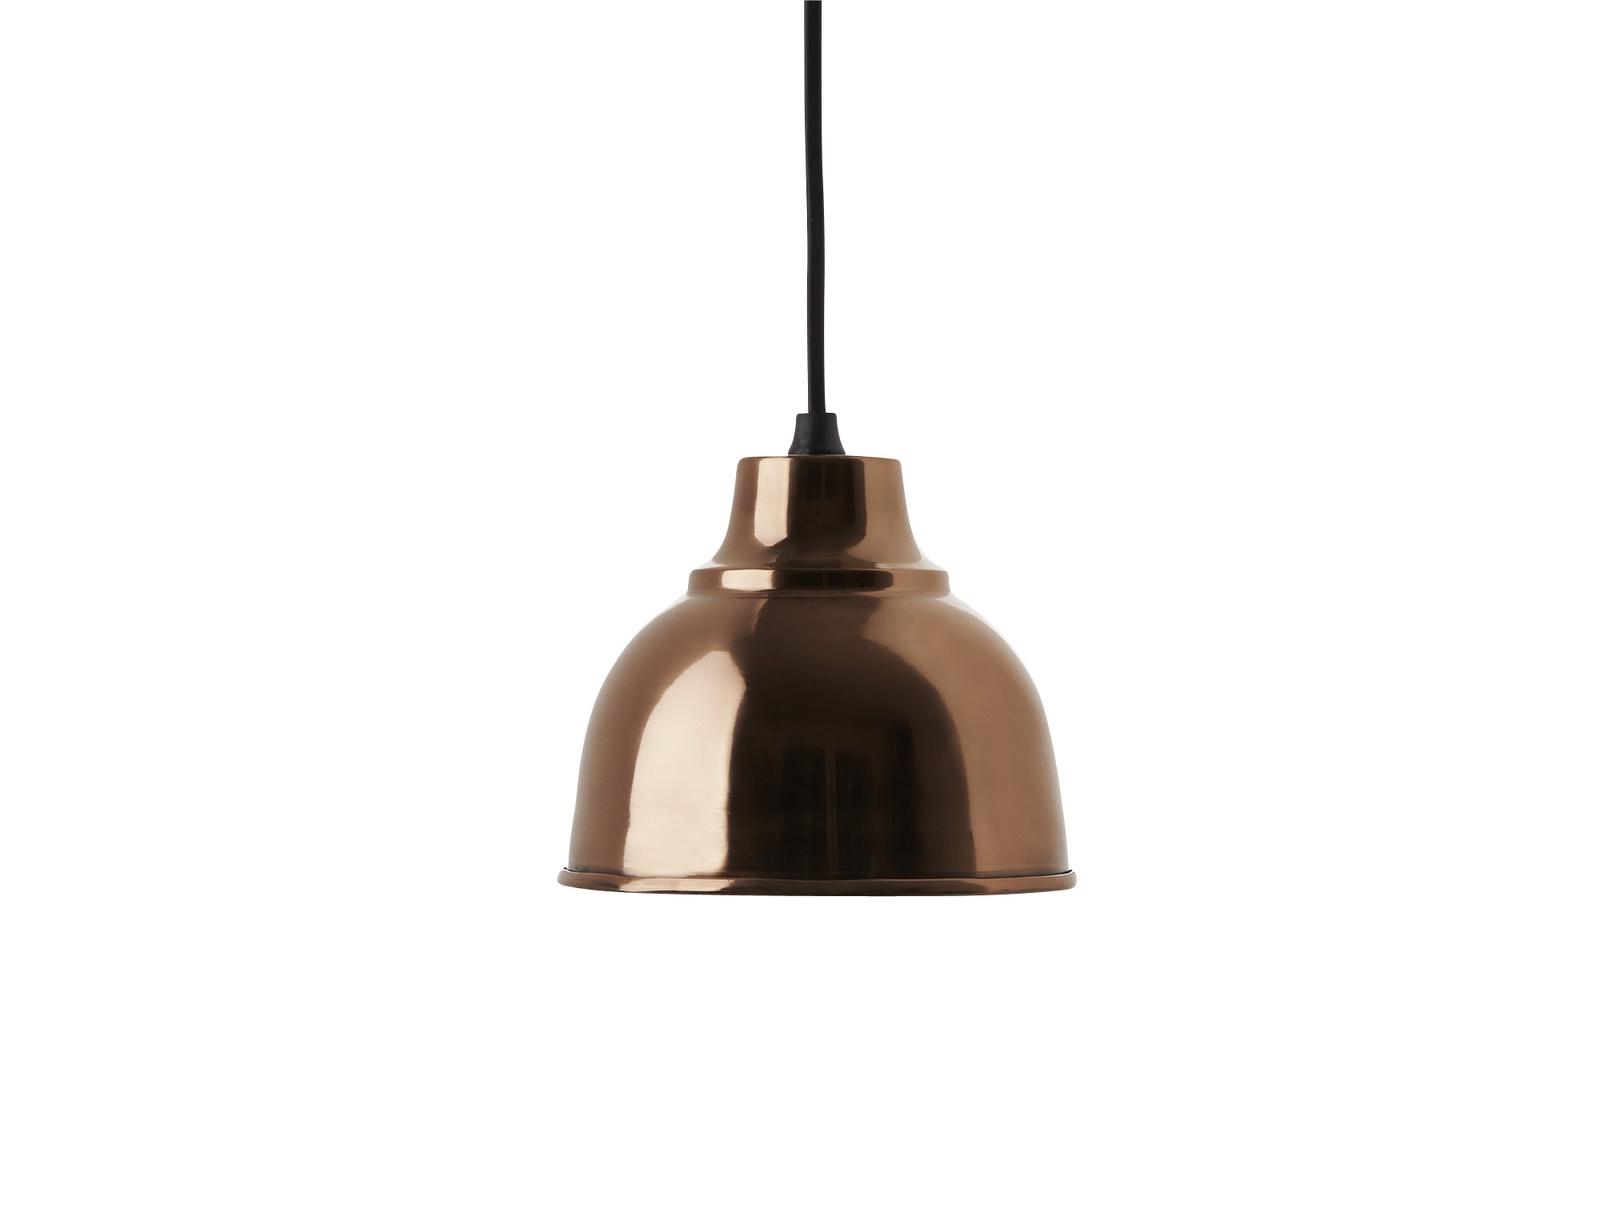 Подвесной светильник Molly Marais Molly Marais цены онлайн